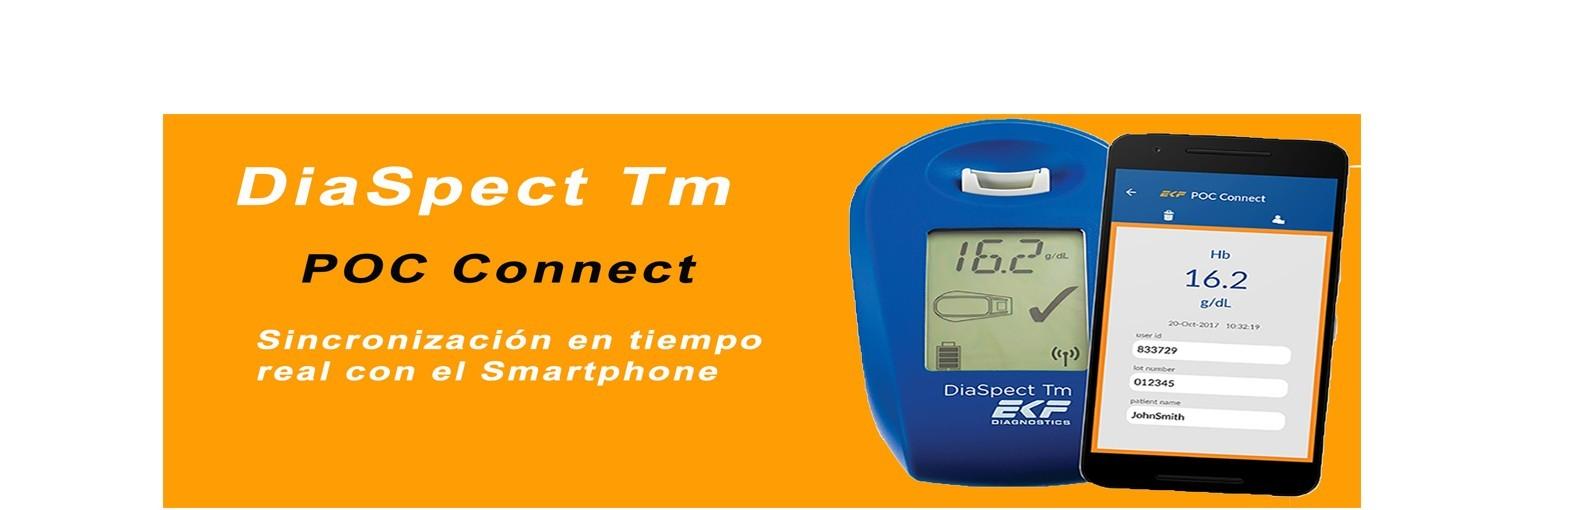 Medidor de Hemoglobina DiaSpect Tm